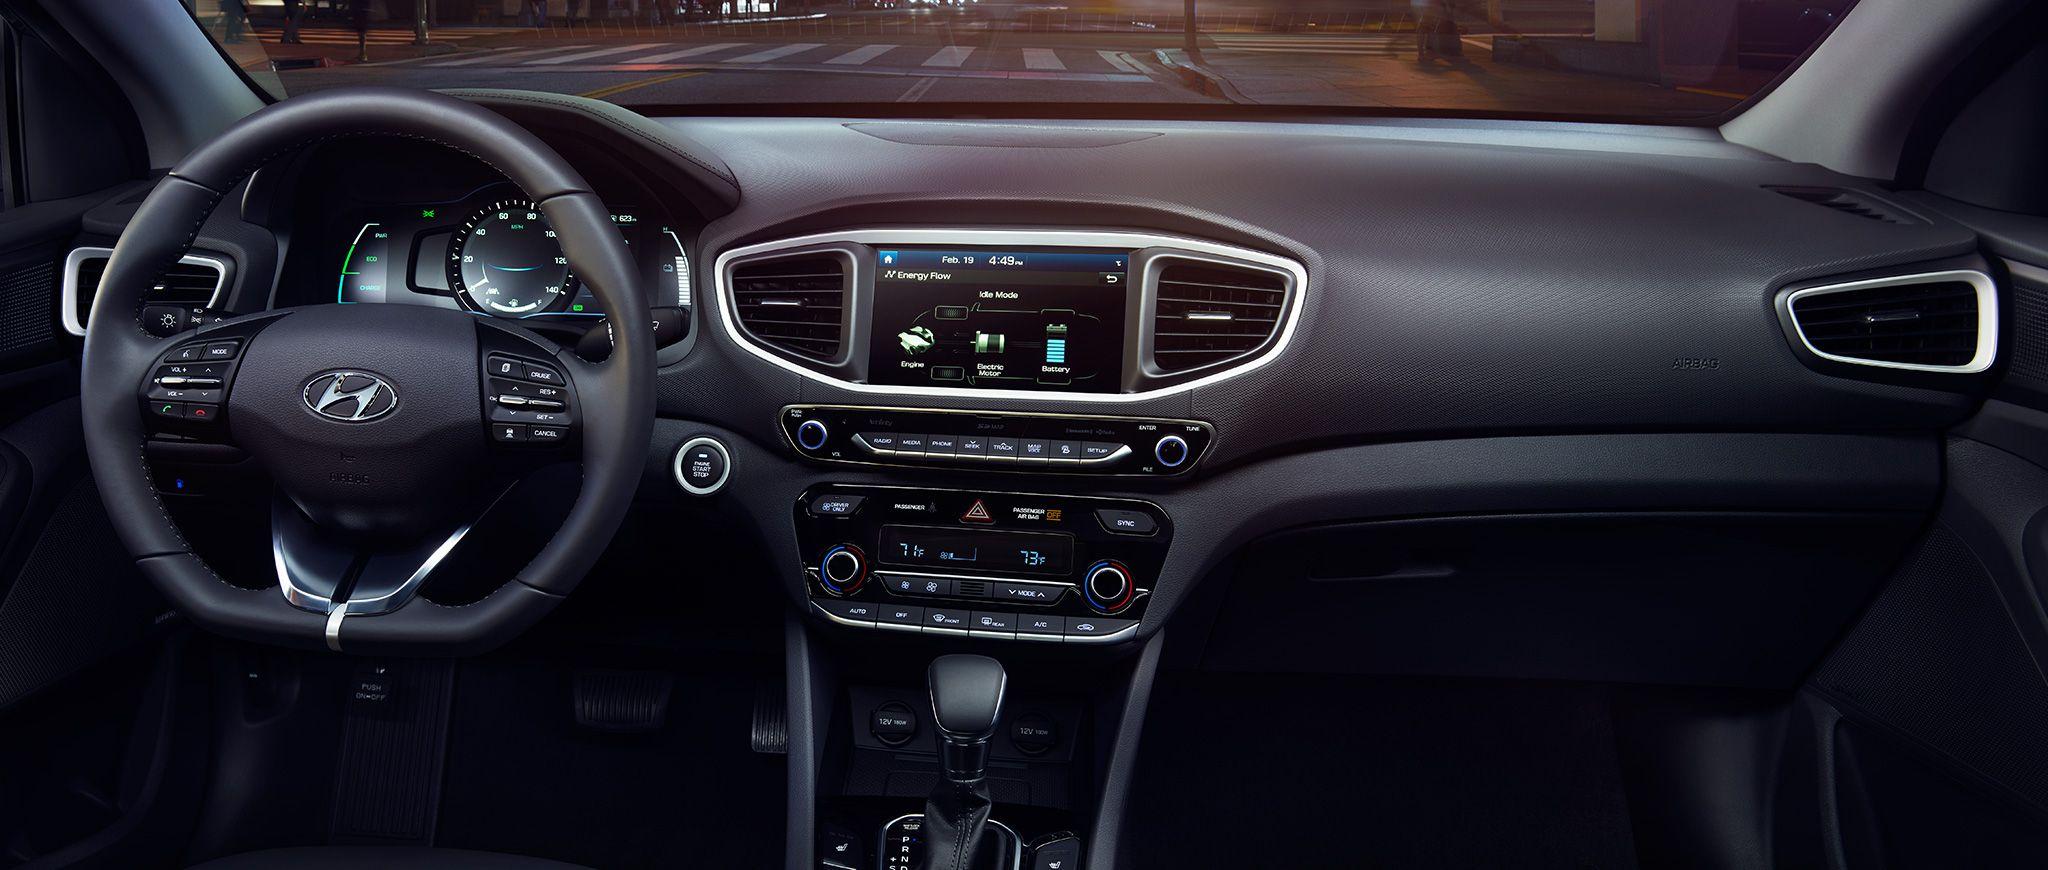 Hyundai Ioniq Hybrid Ev Black Interior Hyundai Most Fuel Efficient Cars Fuel Efficient Cars